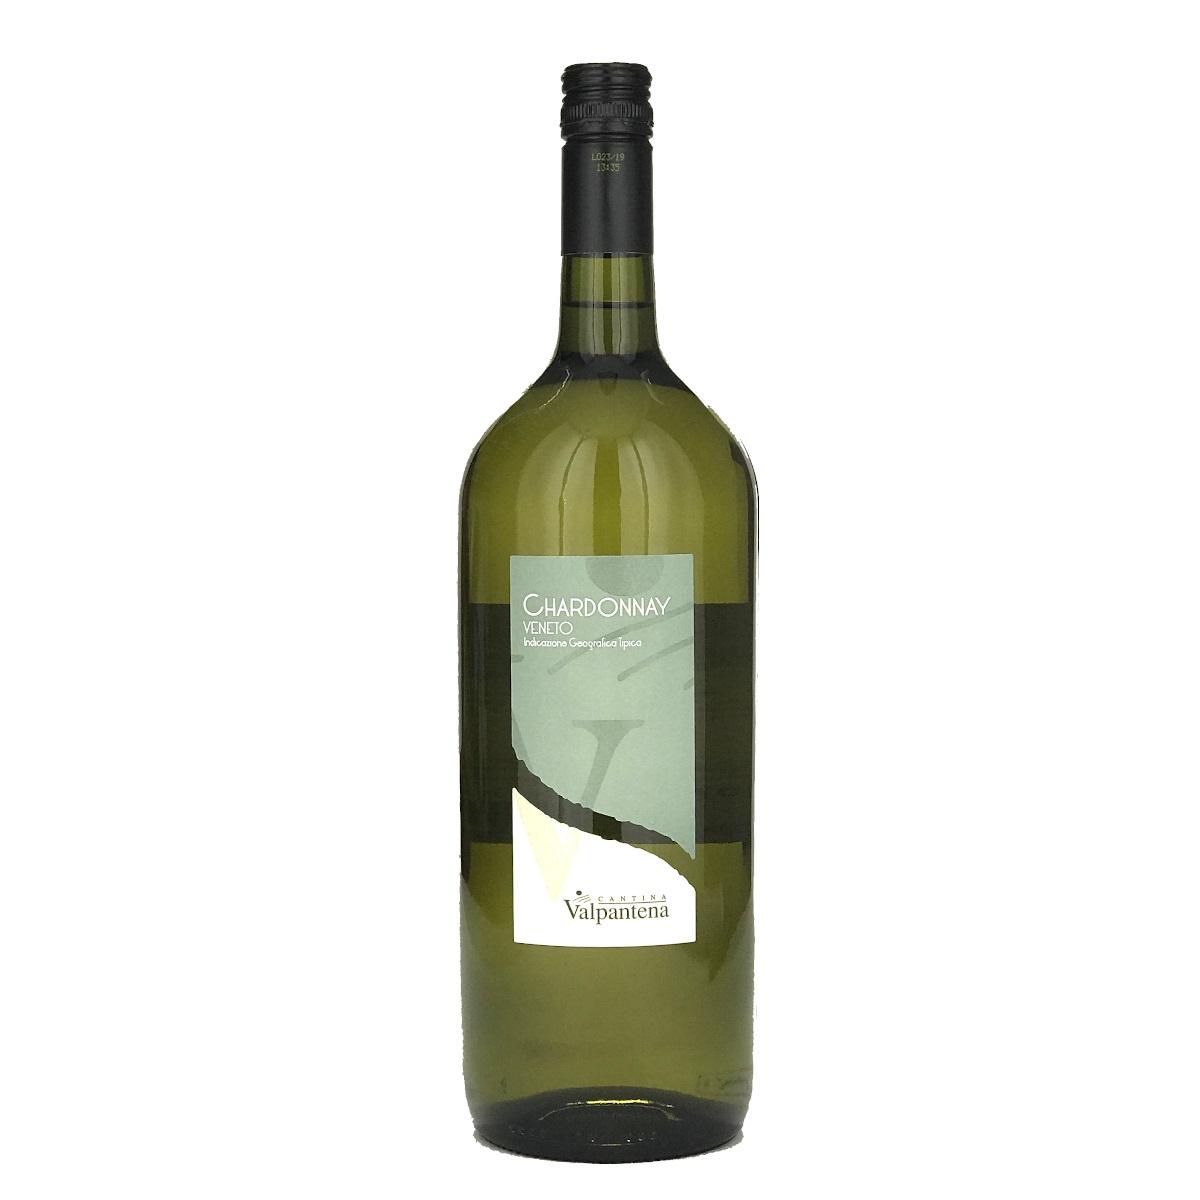 Chardonnay Veneto IGT 2019 Magnum - Cantina Valpantena